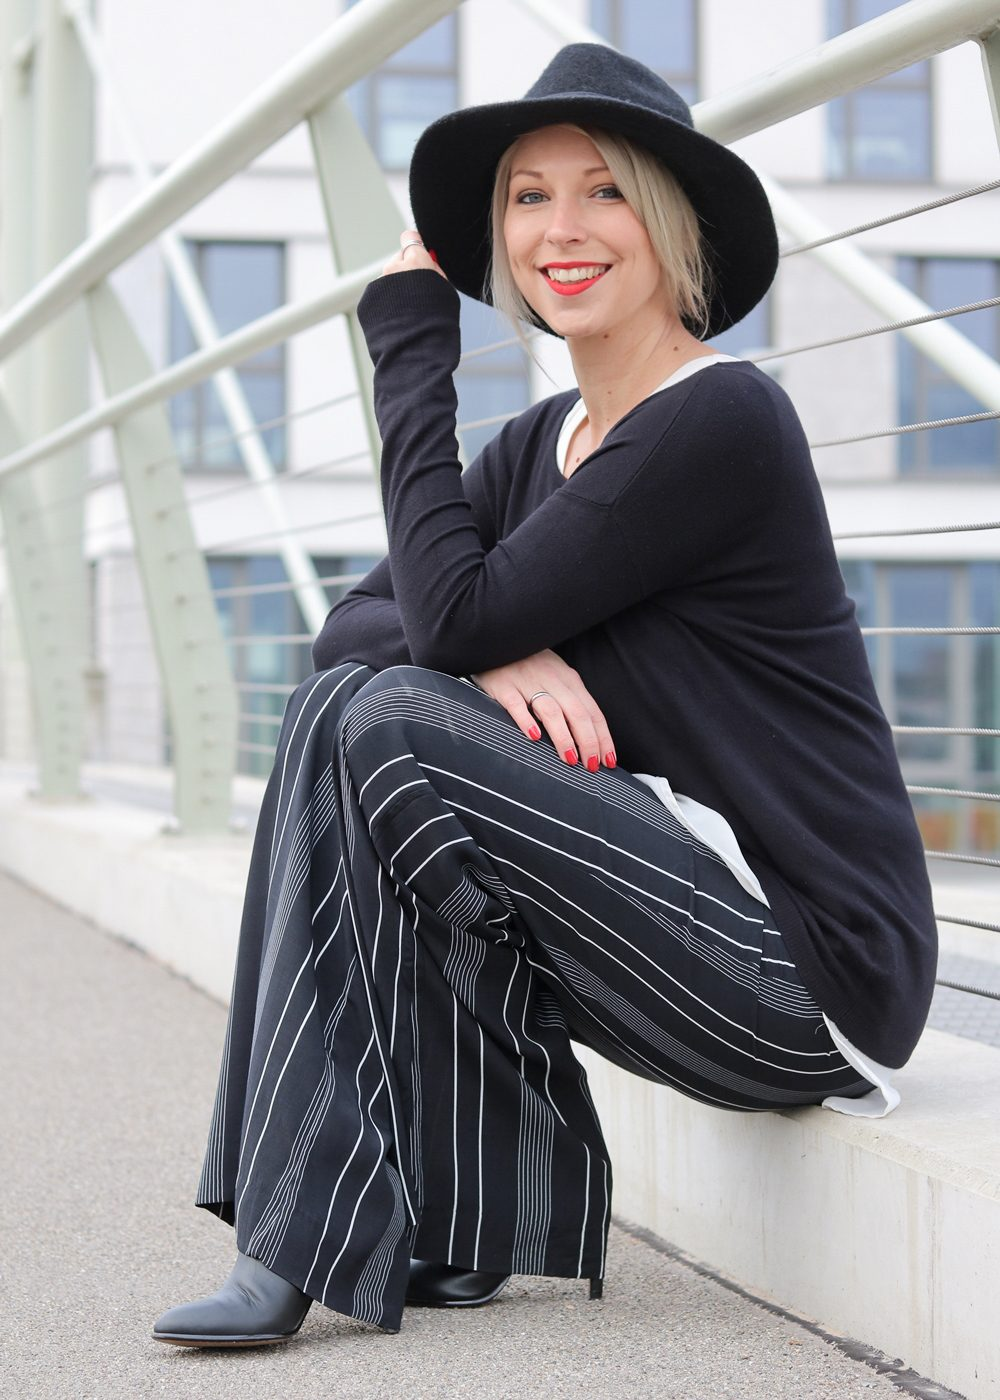 fashionblogger-outfit-palazzohose-streifen-mango-sweater-hut-12-von-17